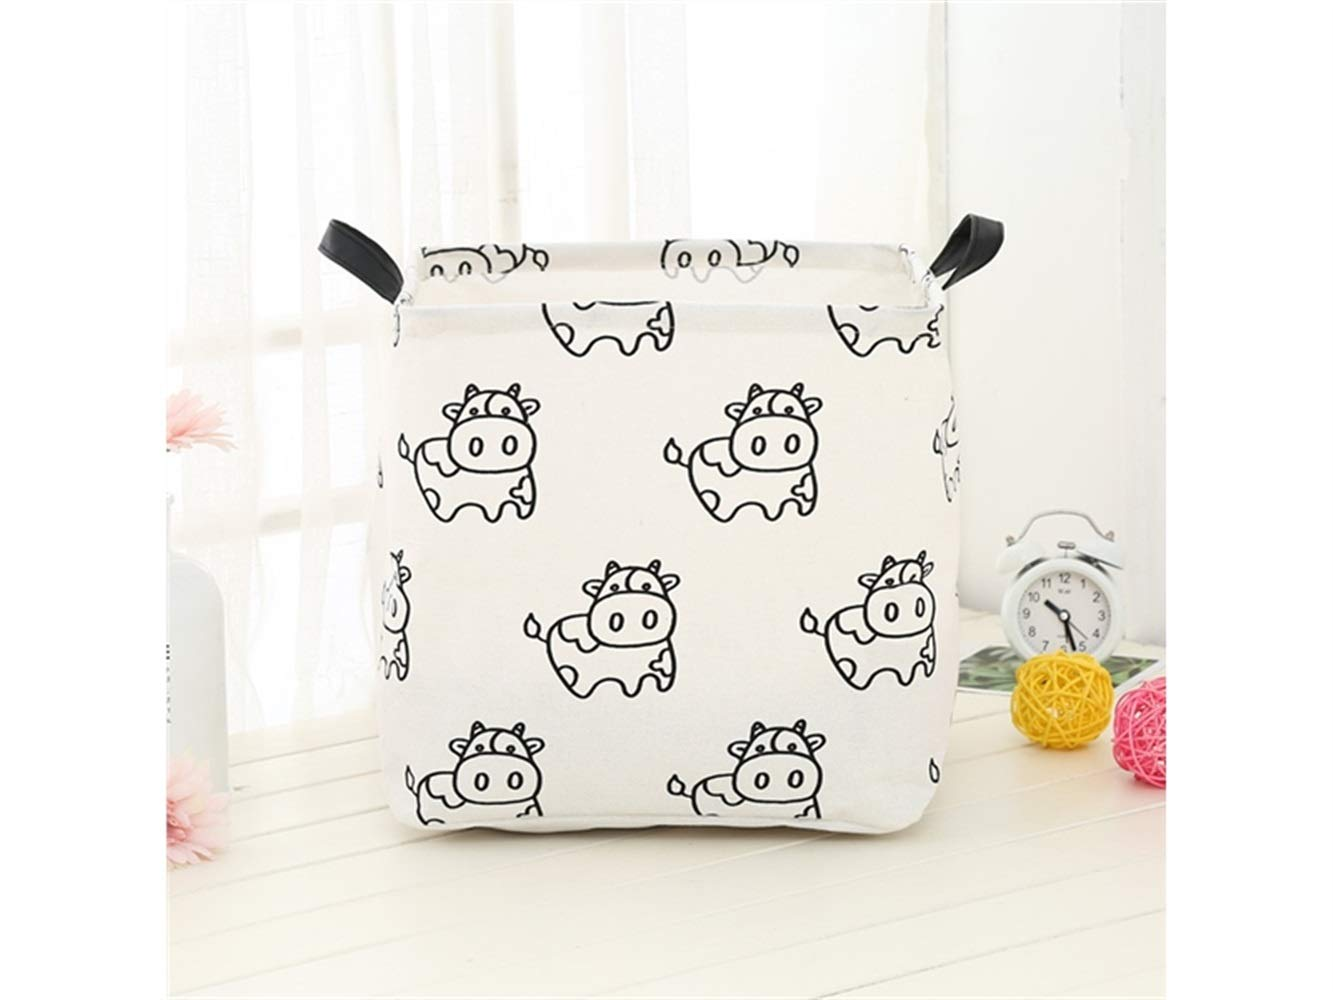 Yunqir Storage Box Calf Pattern Storage Box Laundry Basket Cotton and Linen Storage Box (White)